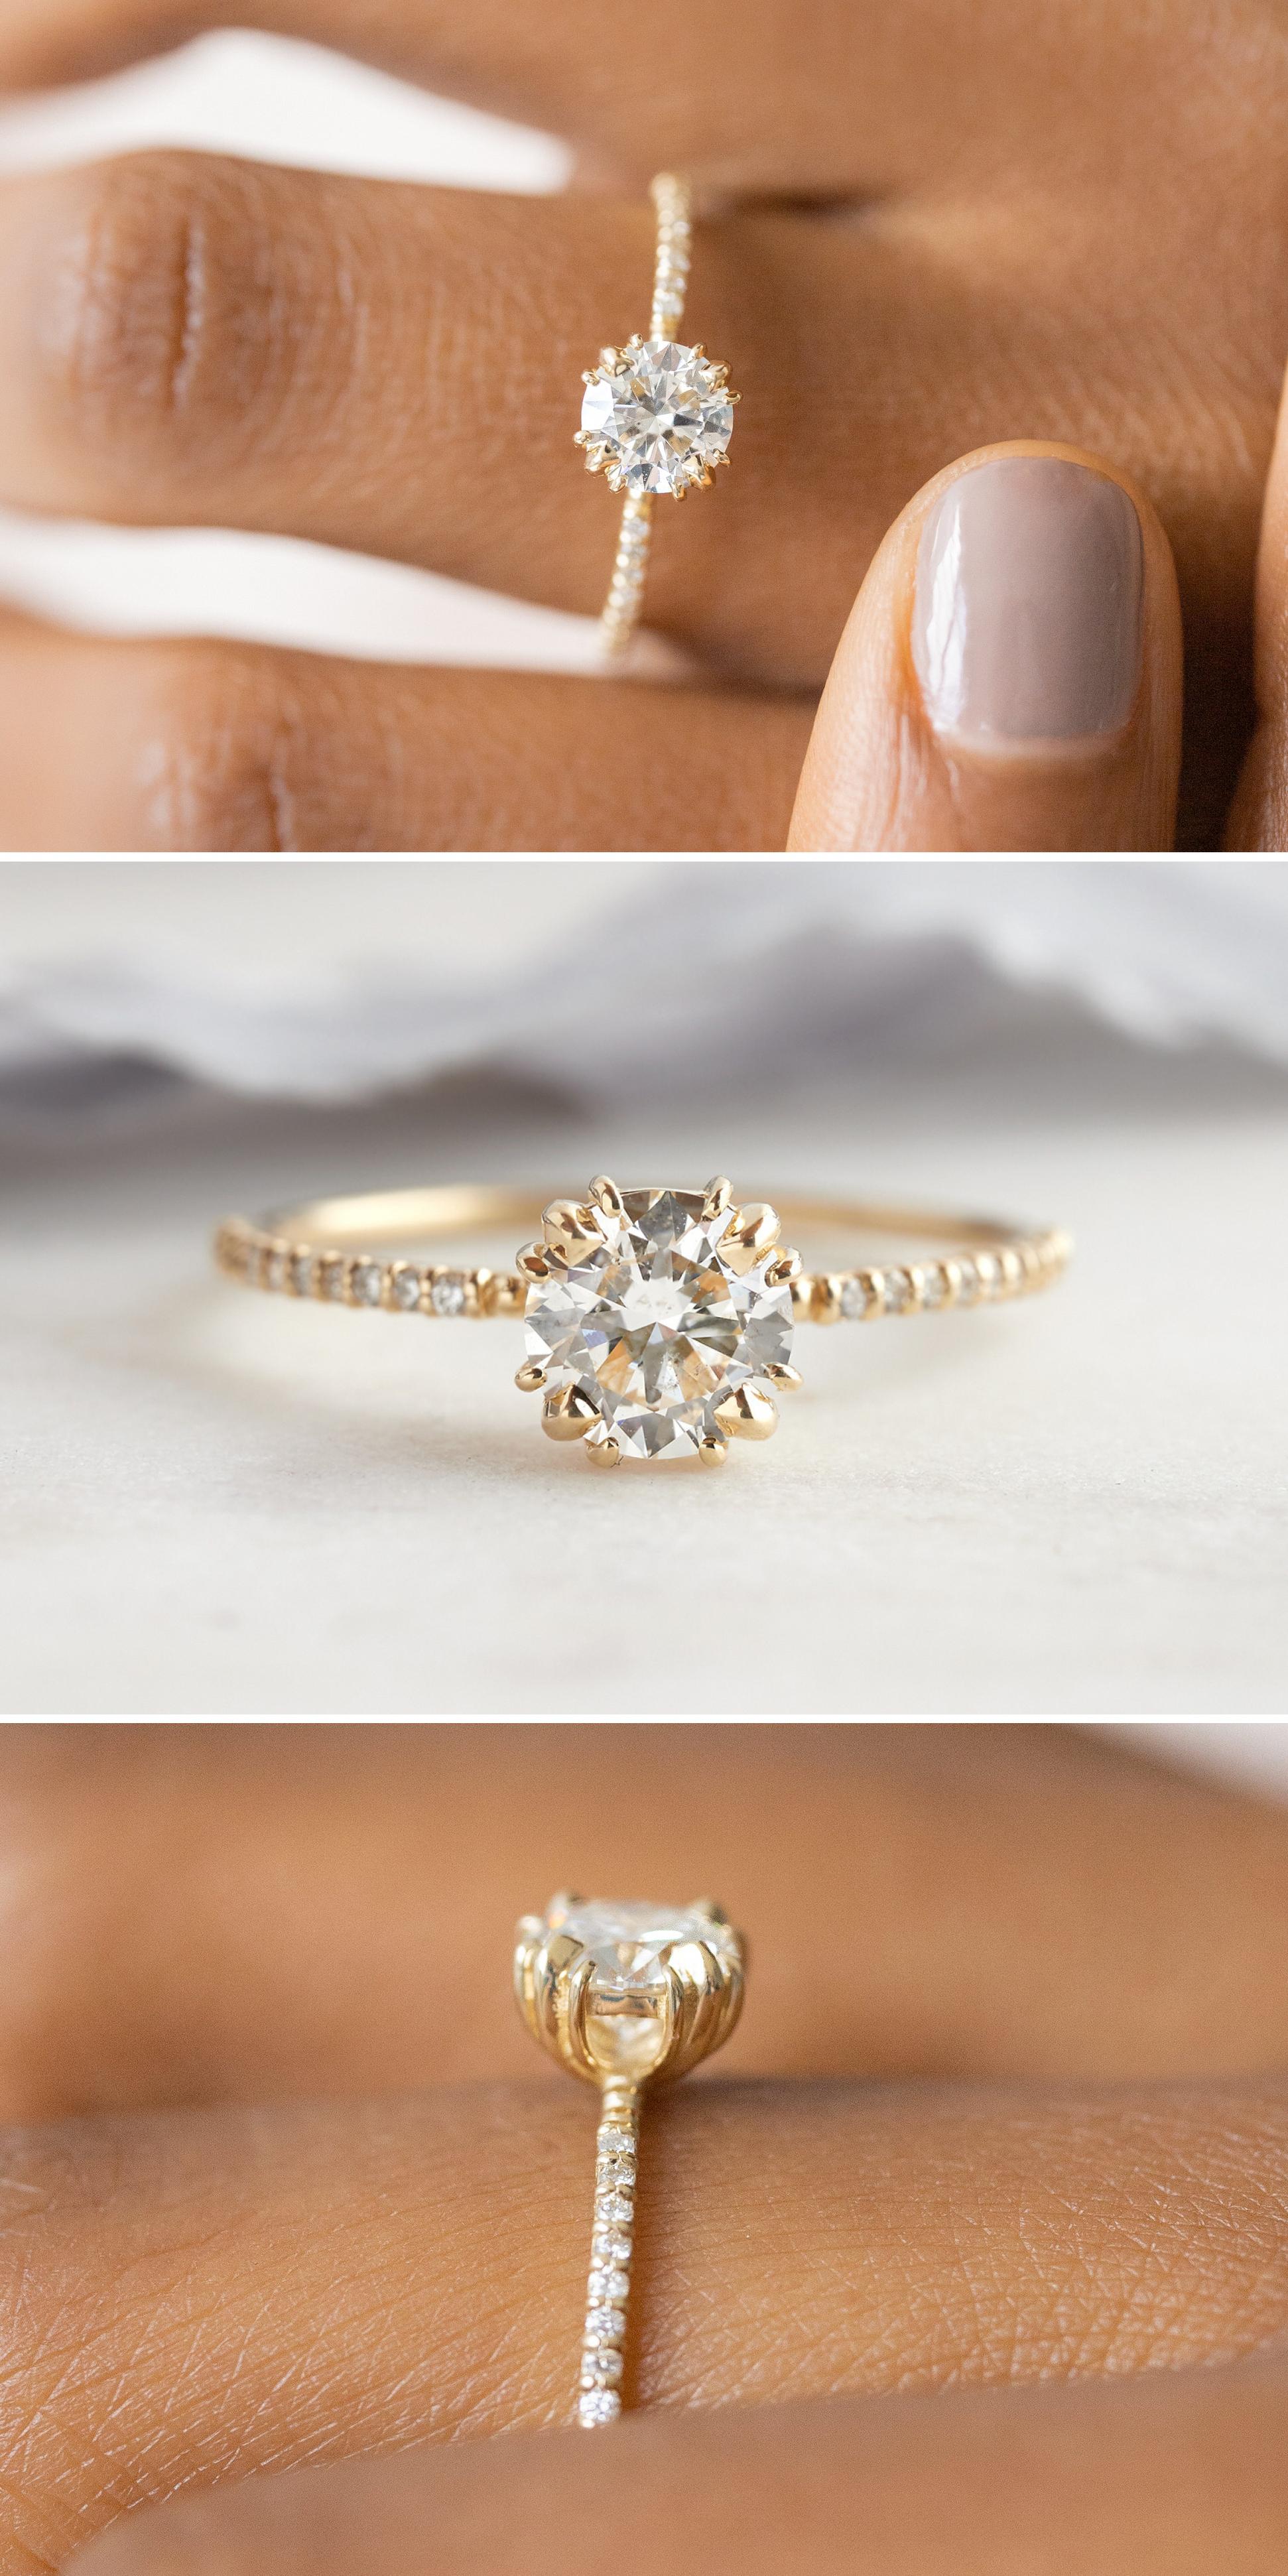 Verlobungsring Tropfen Engagementring In 2020 Vintage Engagement Rings 14k Yellow Gold Engagement Ring Aquamarine Engagement Ring